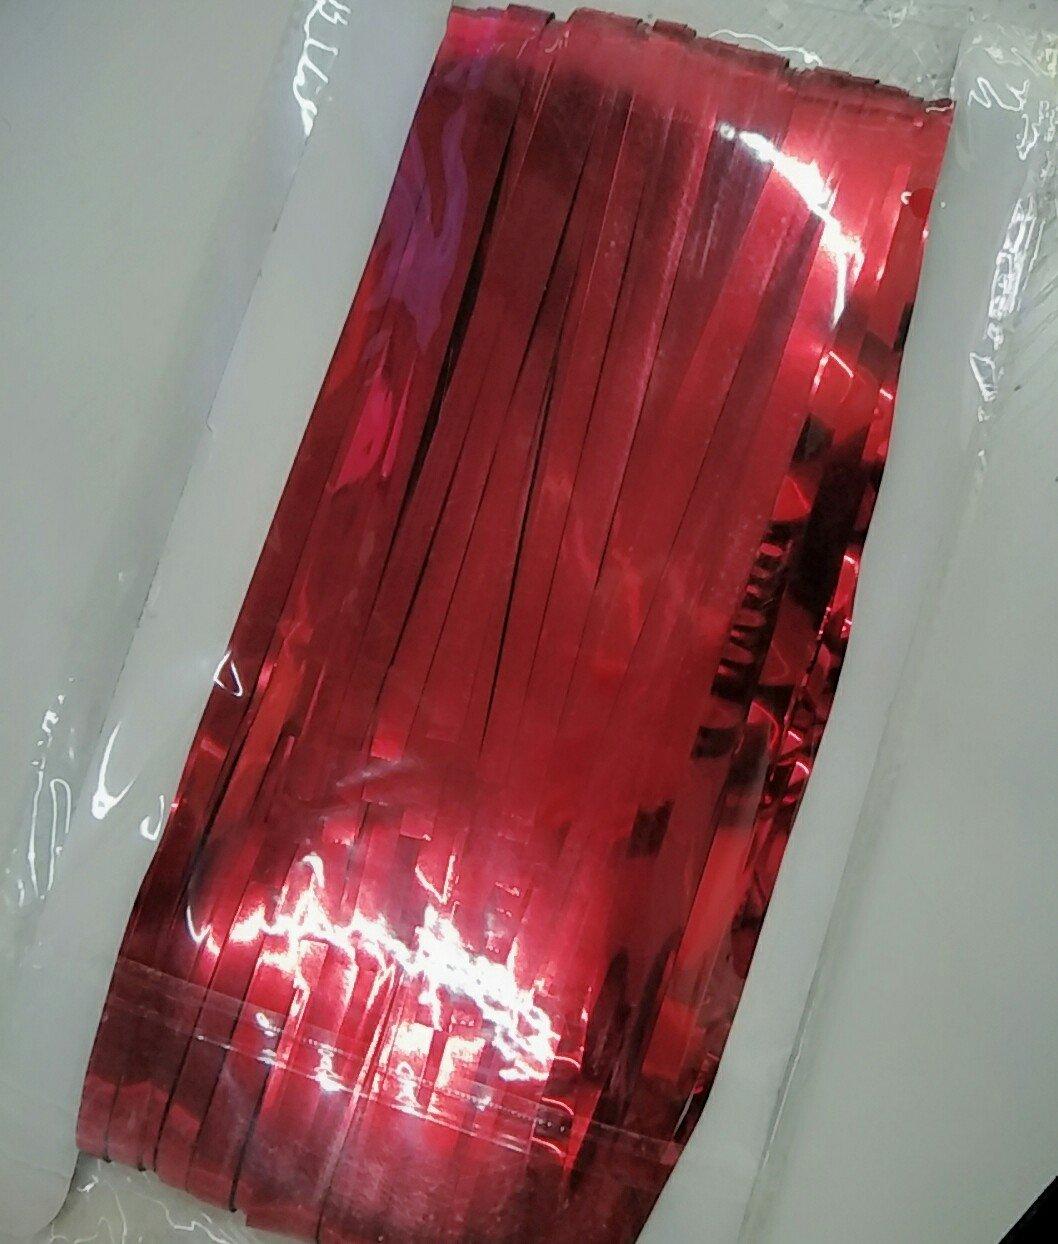 ShinyBeauty Foil Fringe Backdrop-6FTX8FT,Metallic Tinsel Foil Fringe Curtain Door Window Decoration-Red